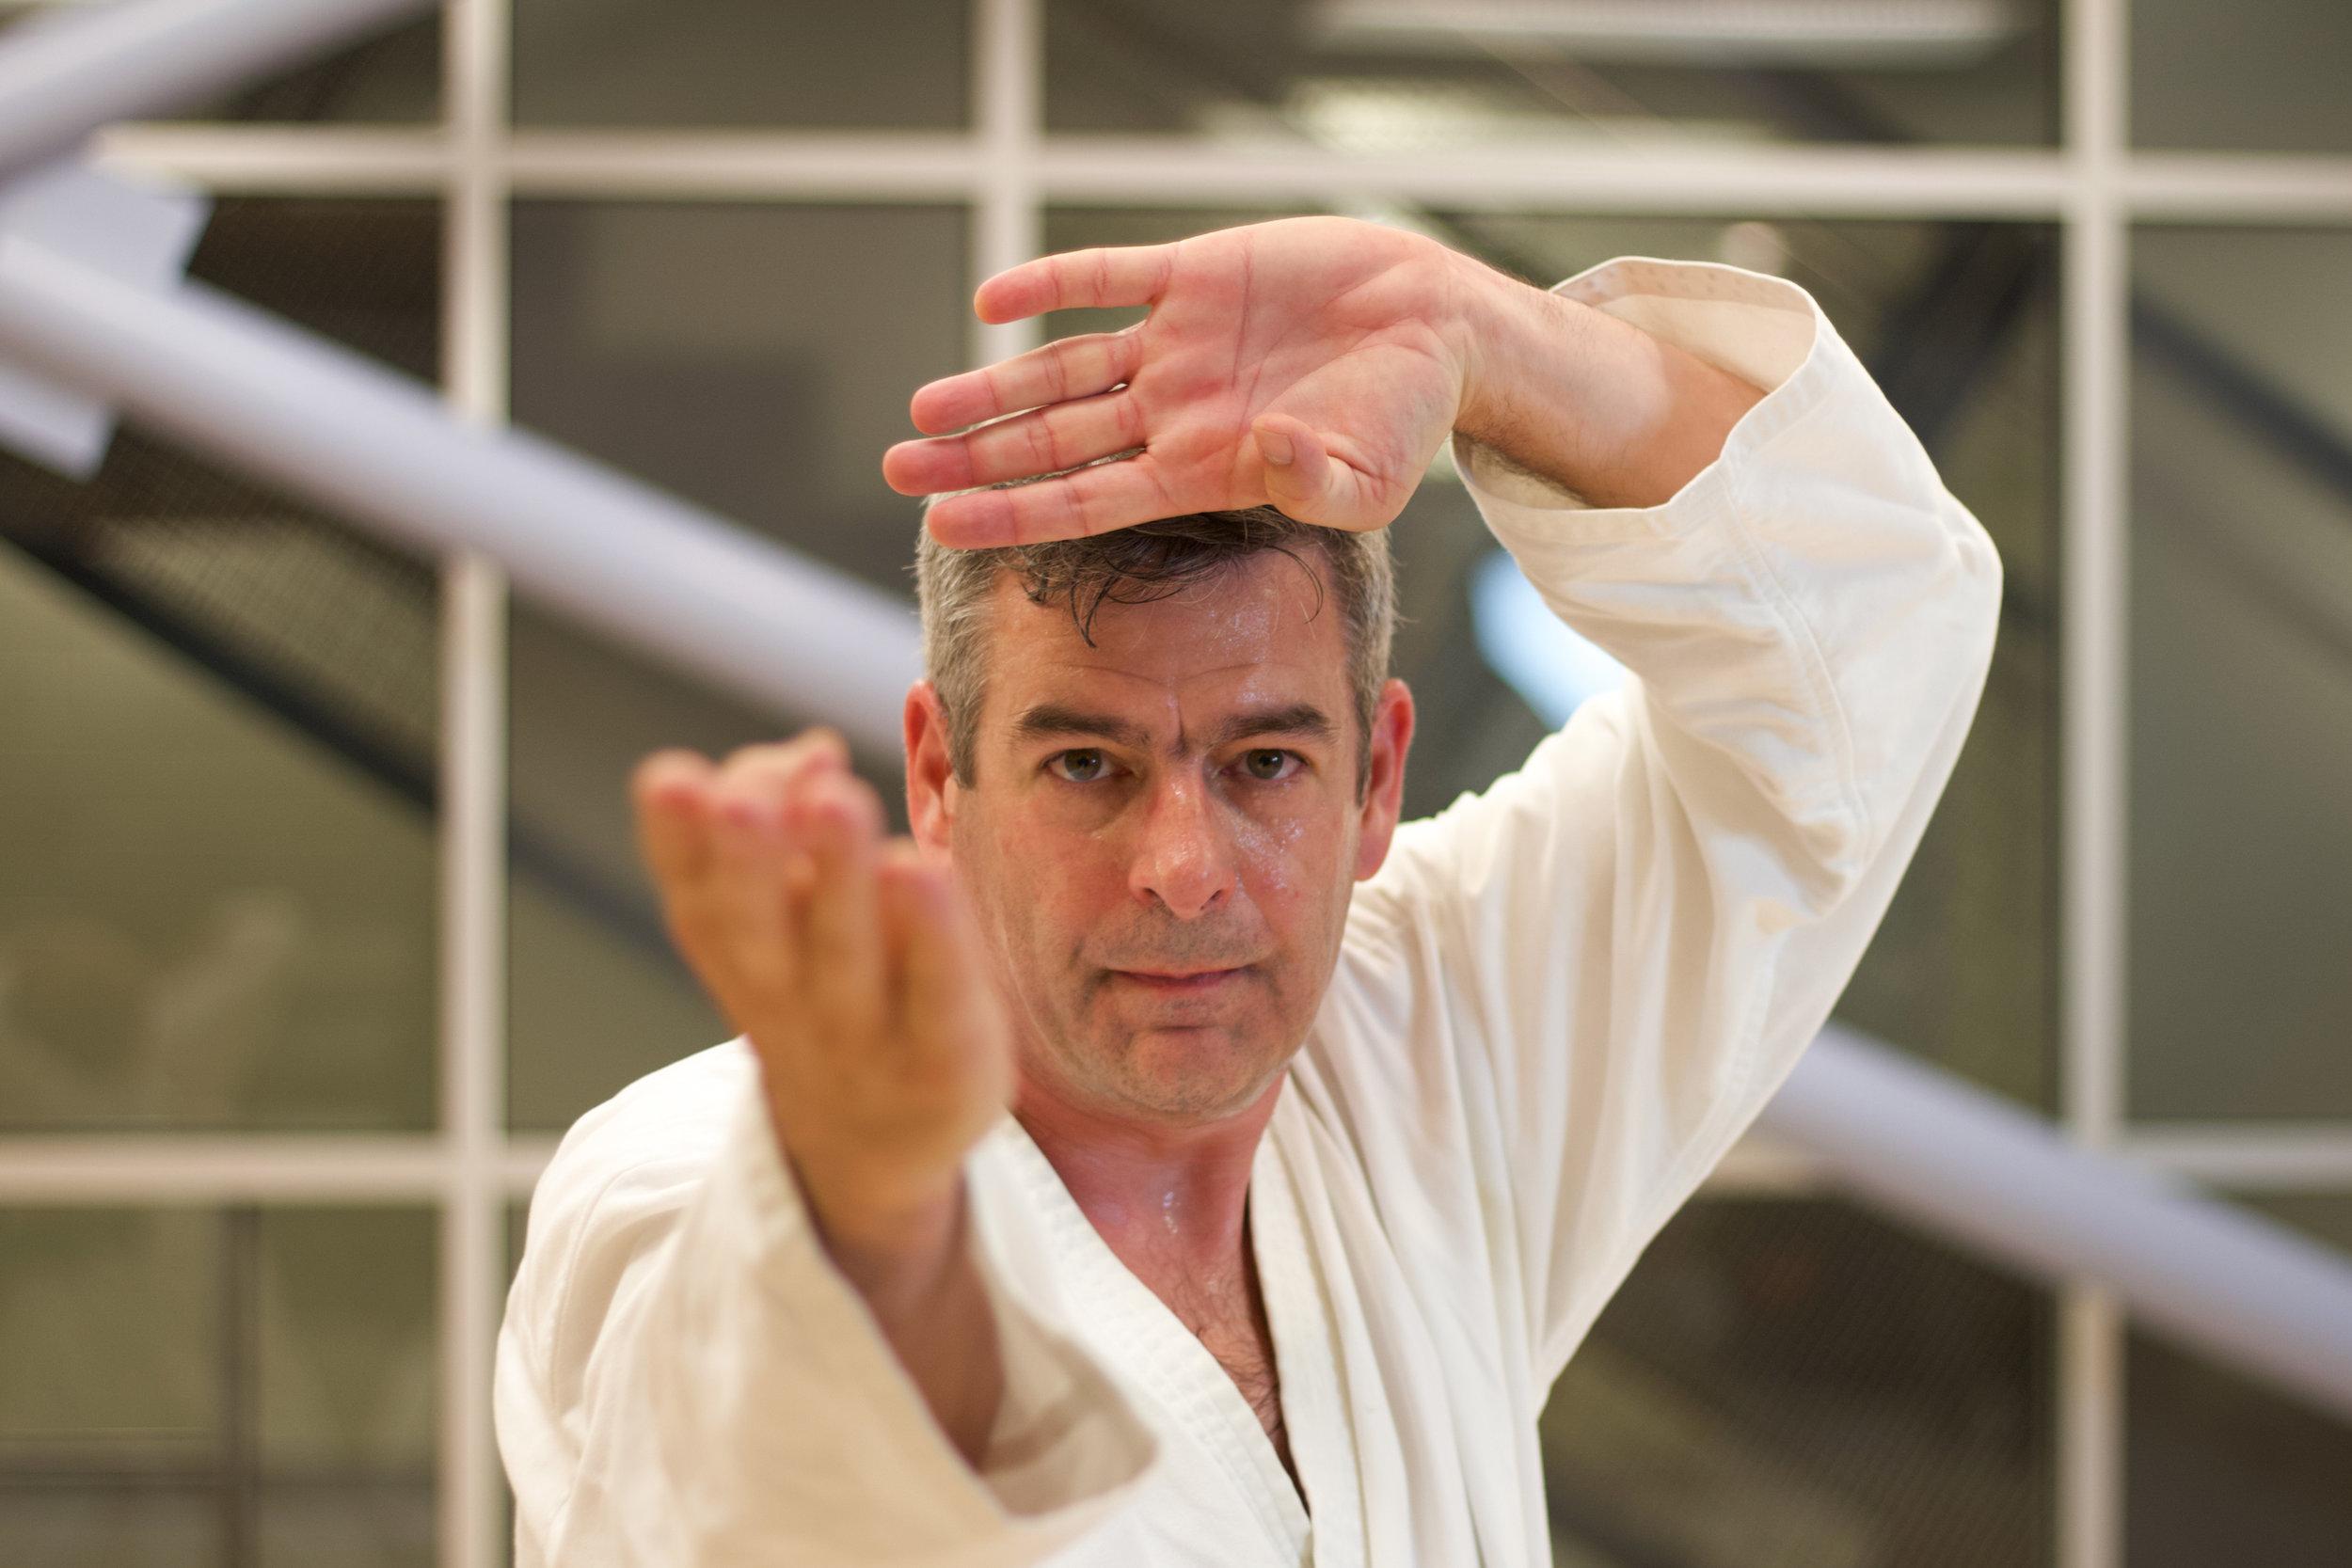 - 11. Karate is just like hot water; if you do not give it continuous heat, it will become cold— Karate Wa Yu No Gotoku Taezu Netsu O Atae Zareba Motono Mizuni Kaeru12. Do not think that you have to win; think, rather, that you do not have to lose— Katsu kangae wa motsuna; makenu kangae wa hitsuyo13. Move according to your opponent— Tekki ni yotte tenka seyo14. In conflict you must discern the vulnerable from invulnerable points— Tattakai wa kyo-jitsu no soju ikan ni ari15. Consider you opponent's legs and arms as you would lethal swords— Hi to no te-ashi wa ken to omoe16. Be aware at all times that you have millions of potential opponents— Danshi mon o izureba hyakuman no teki ari